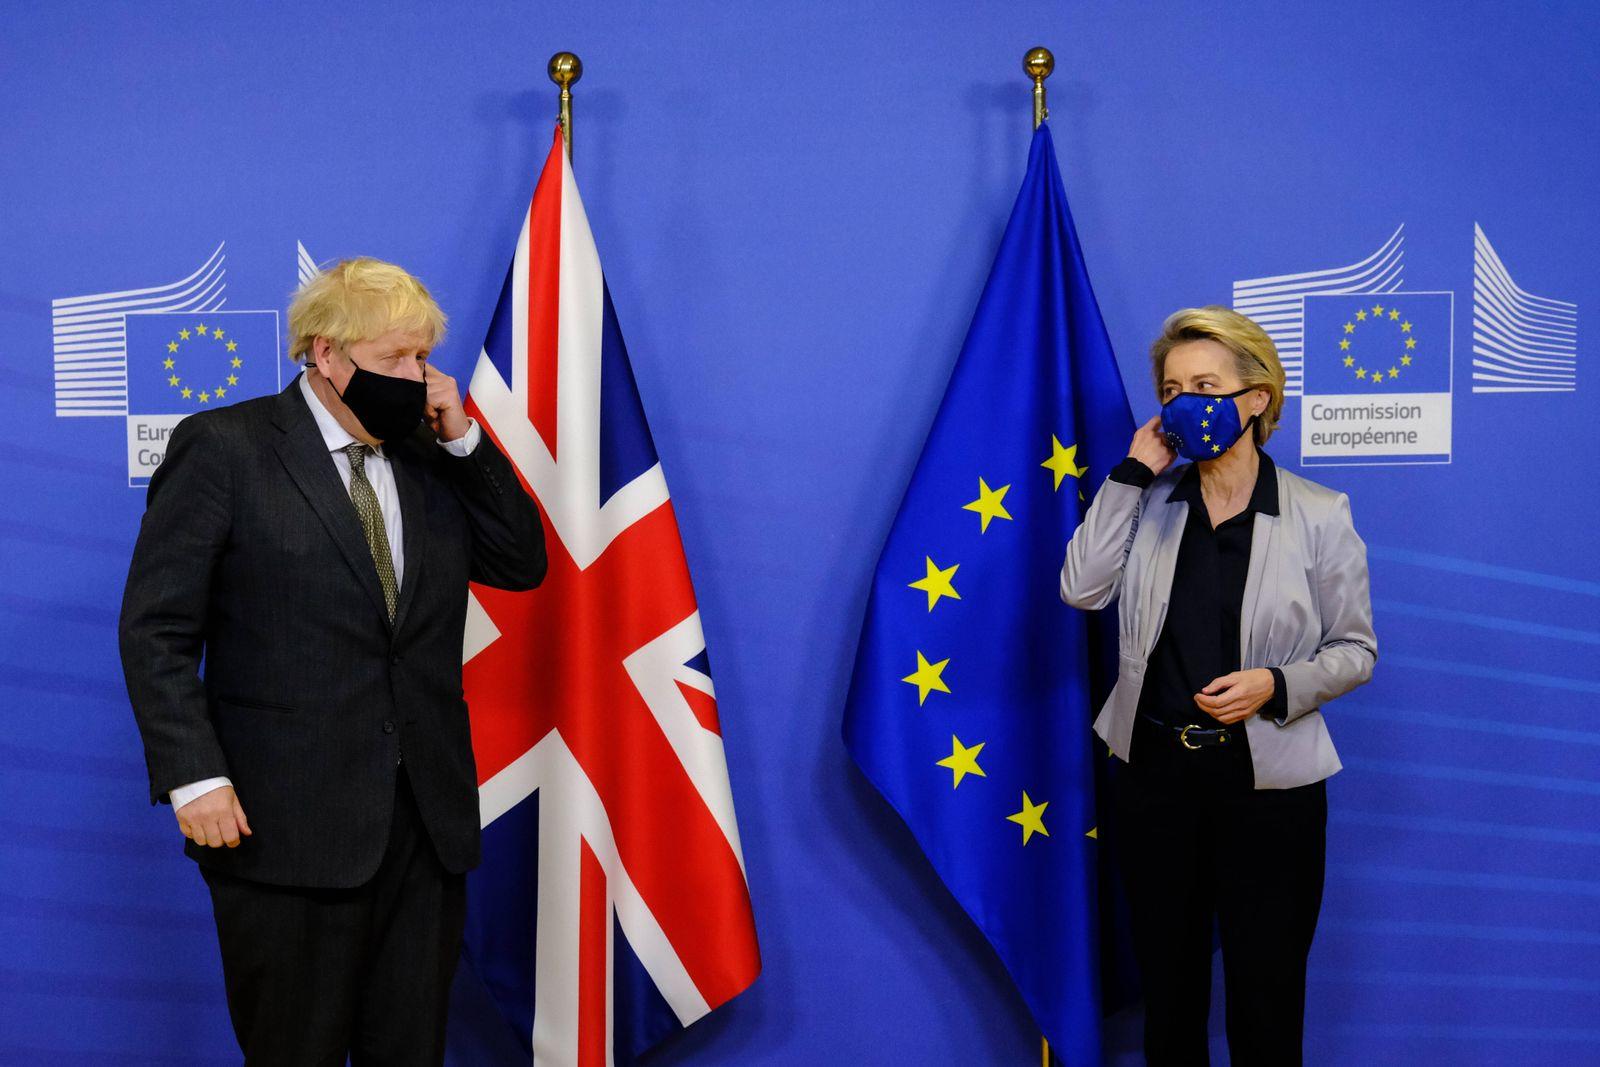 BELGIUM-EU-BRITAIN-DIPLOMACY-TRADE-BREXIT European Commission President Ursula von der Leyen welcomes British Prime Min